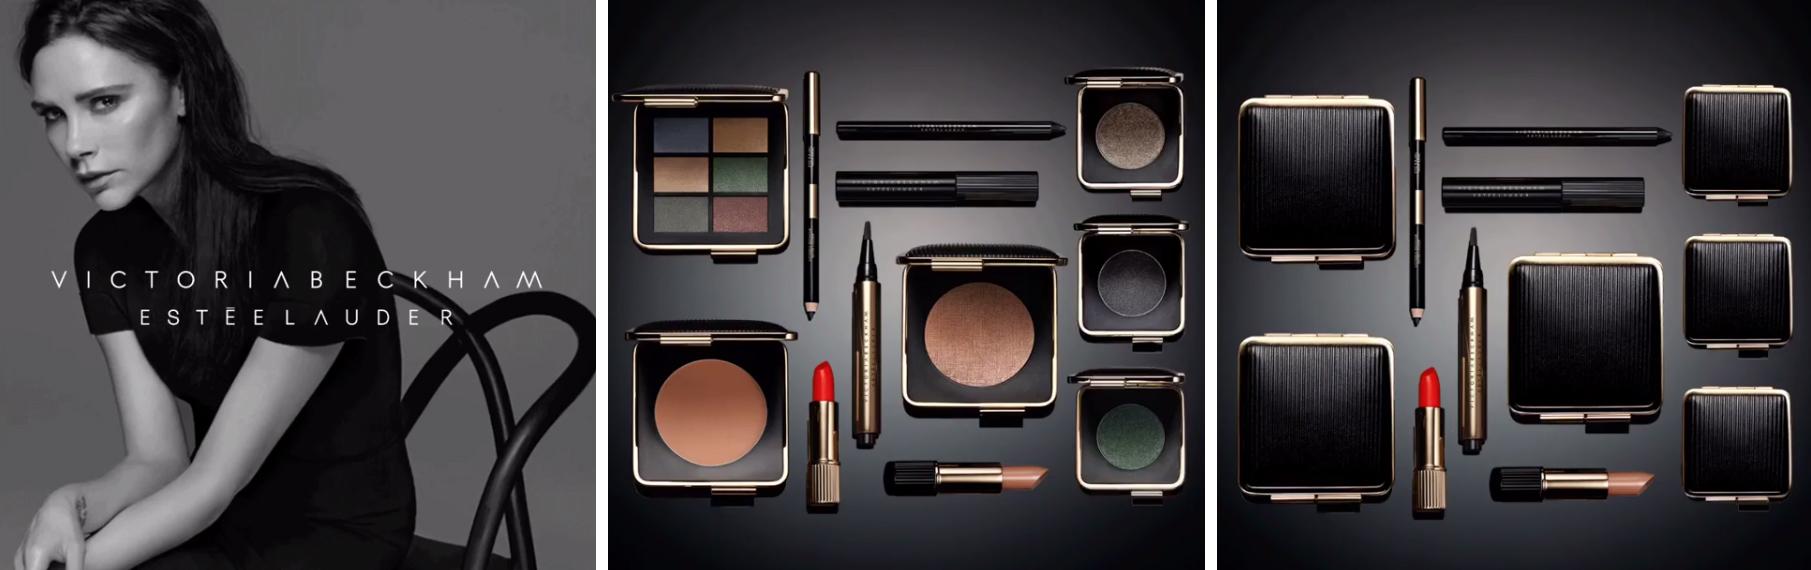 Victoria-Beckham-for-Estee-Lauder-makeup-collection